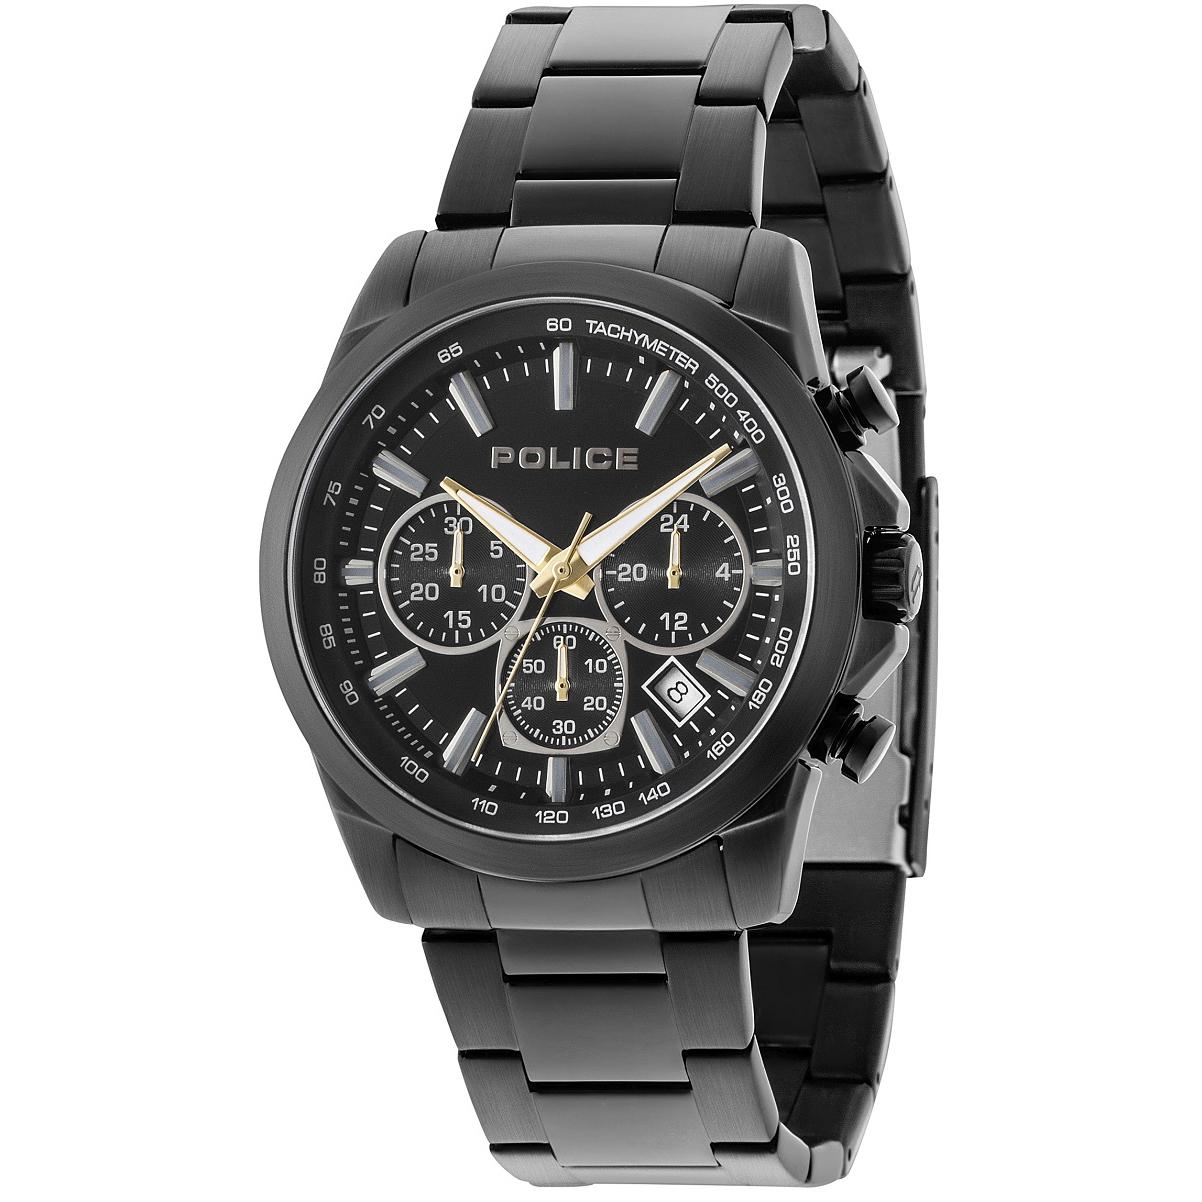 POLICE(ポリス)腕時計GRAMERCY グラマシー ブラック【14964JSB-02MA】